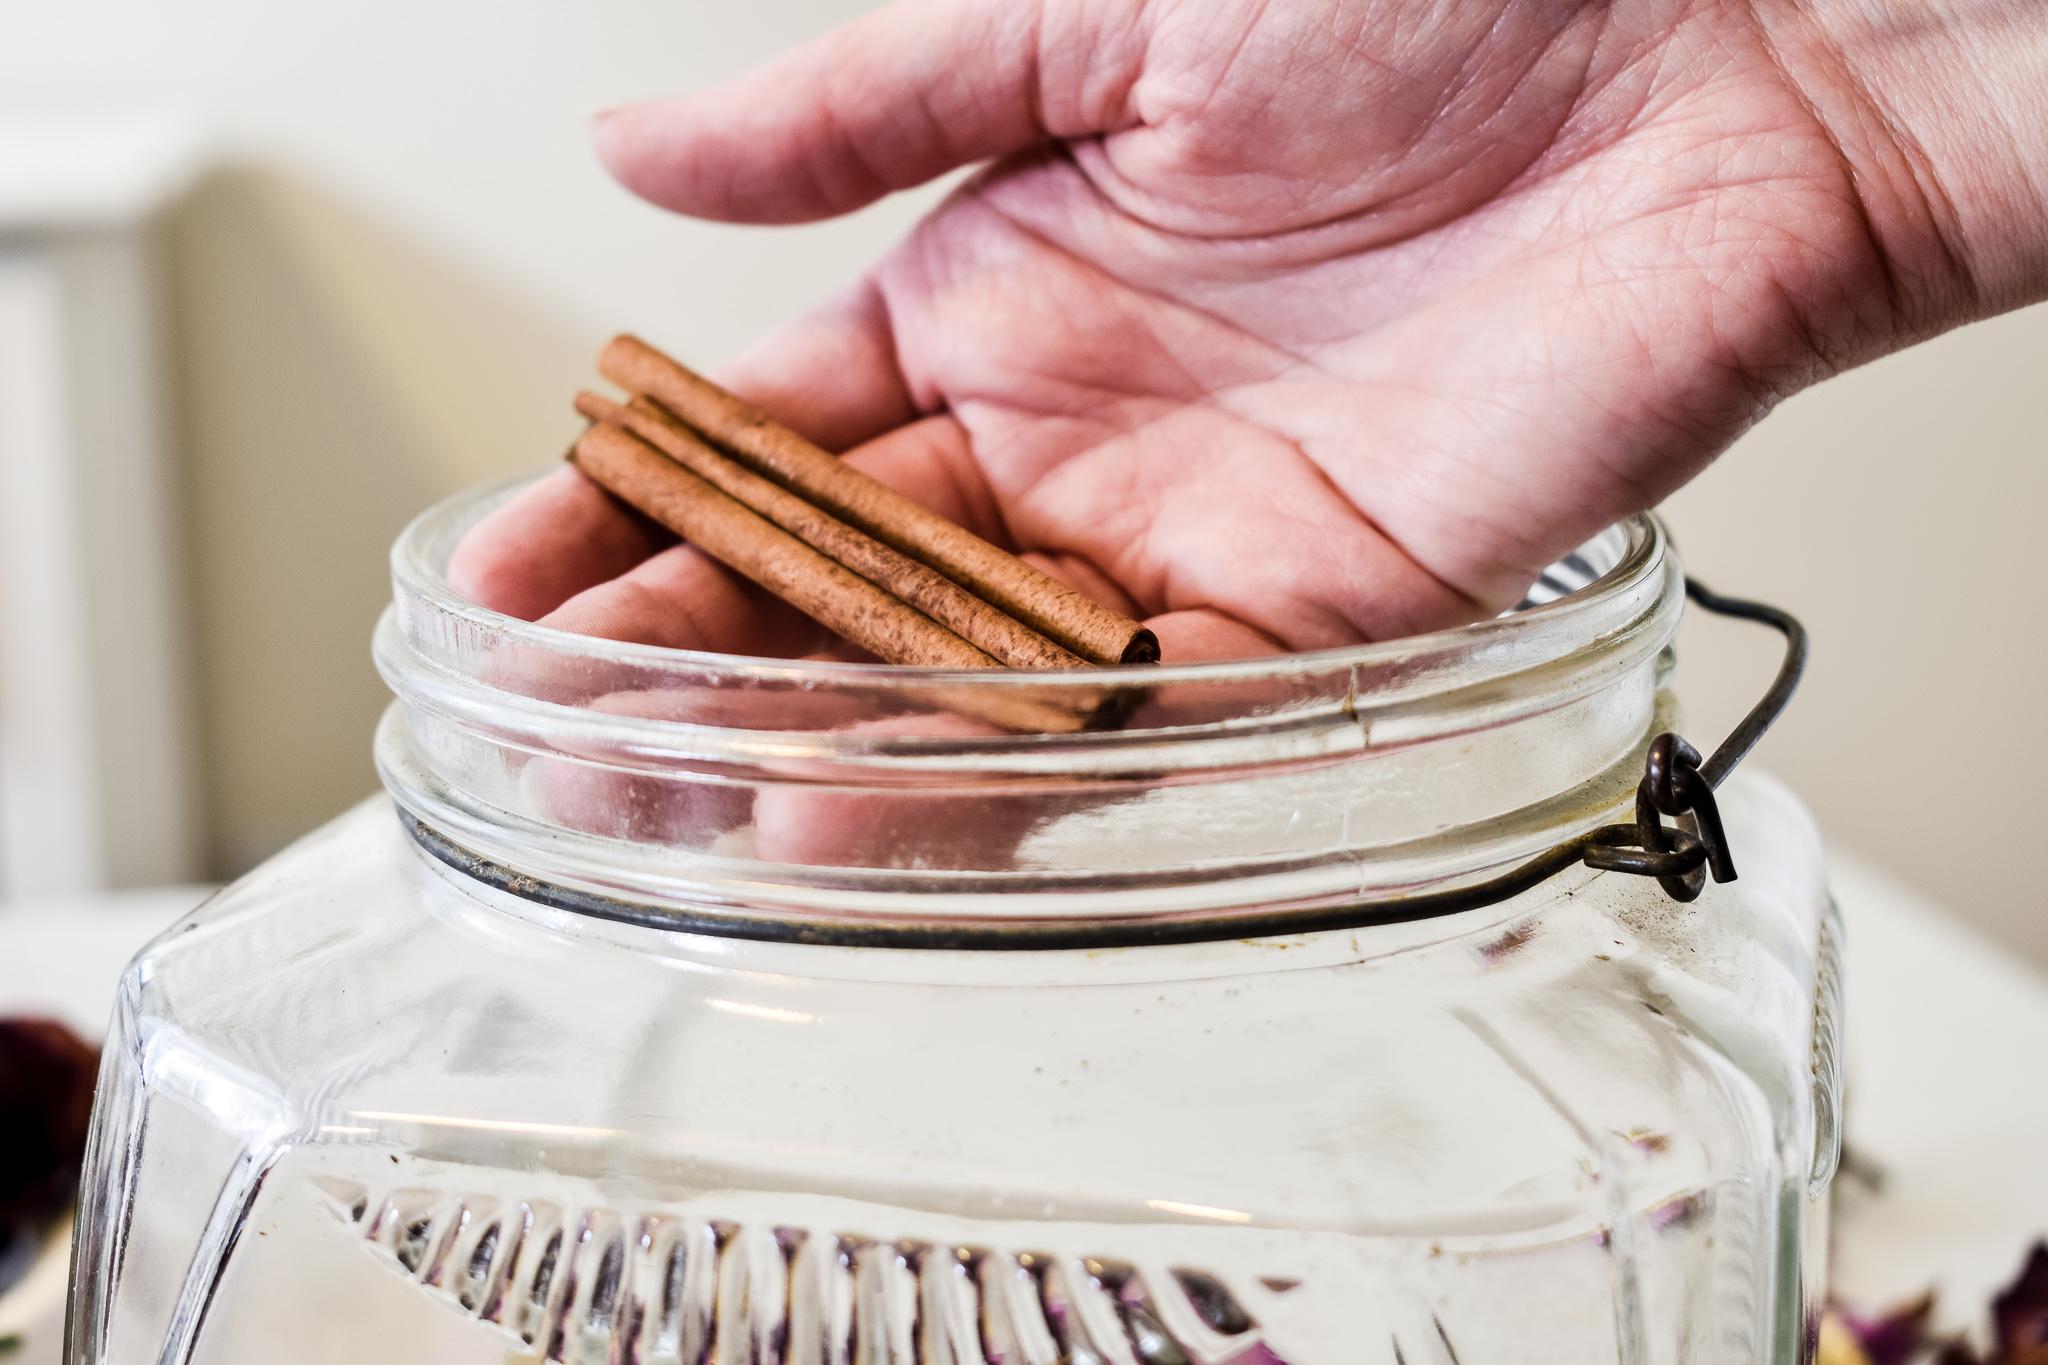 putting cinnamon sticks into a glass jar